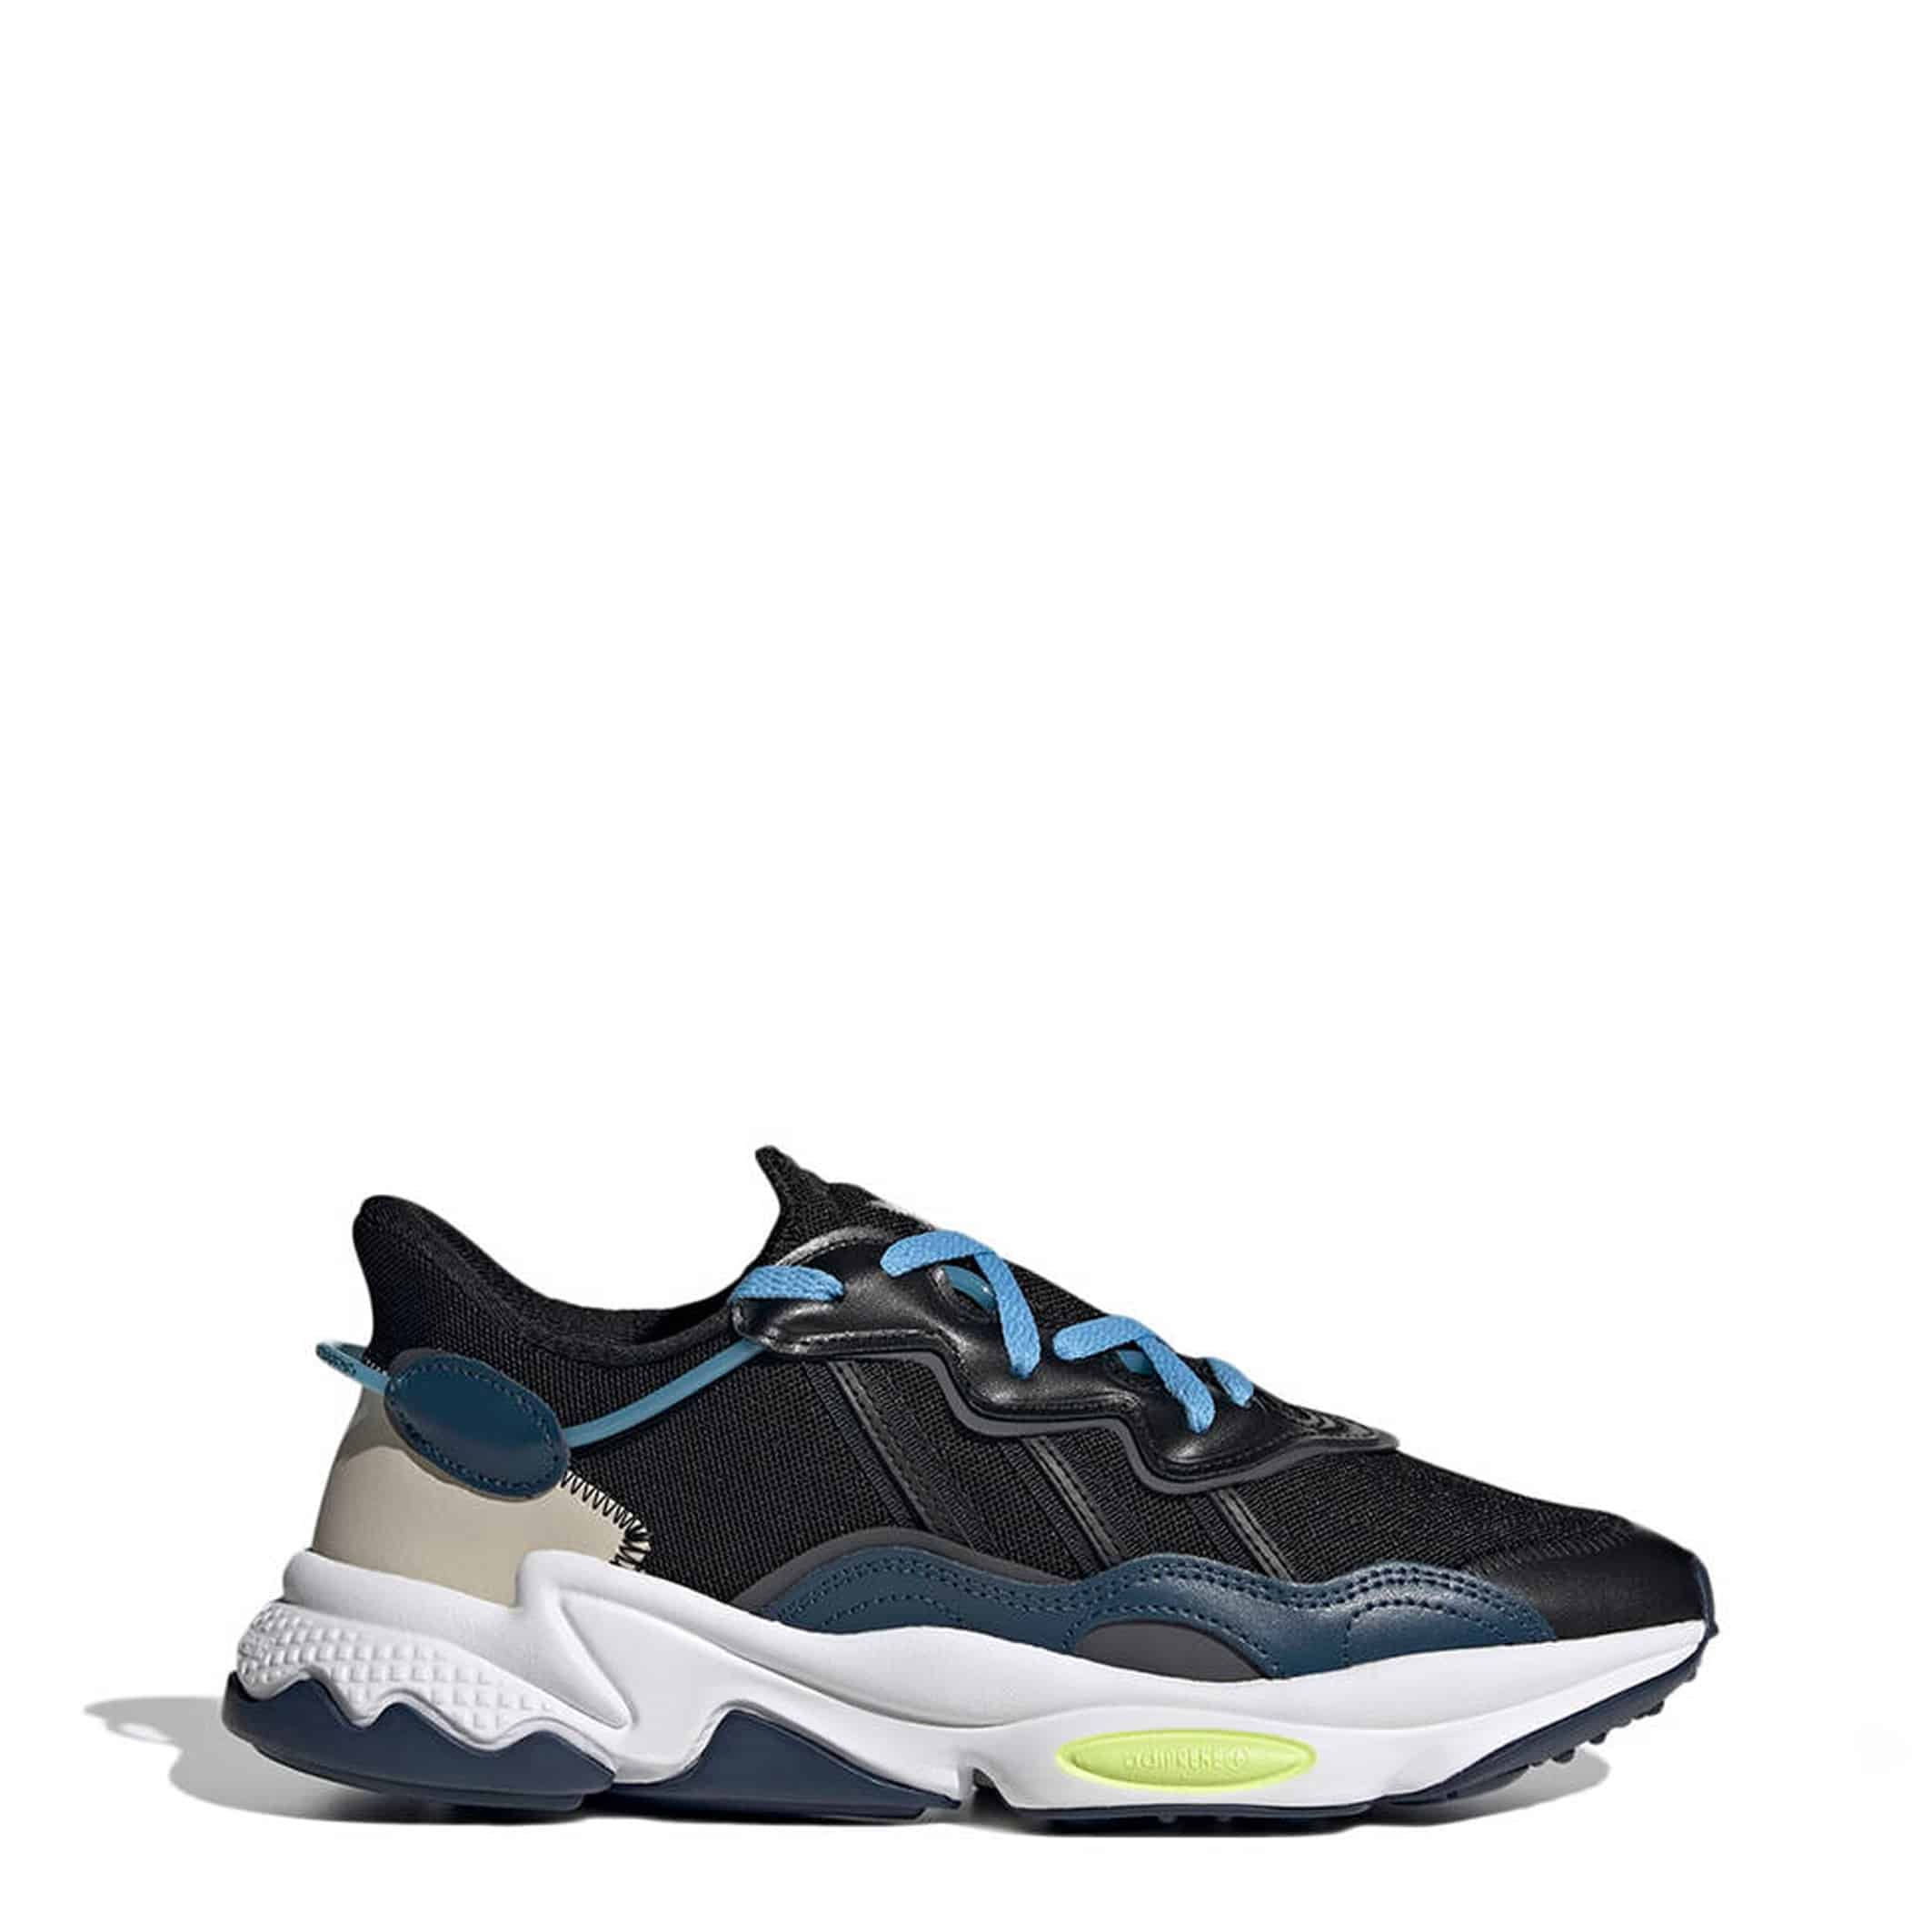 Adidas – Ozweego – Negro